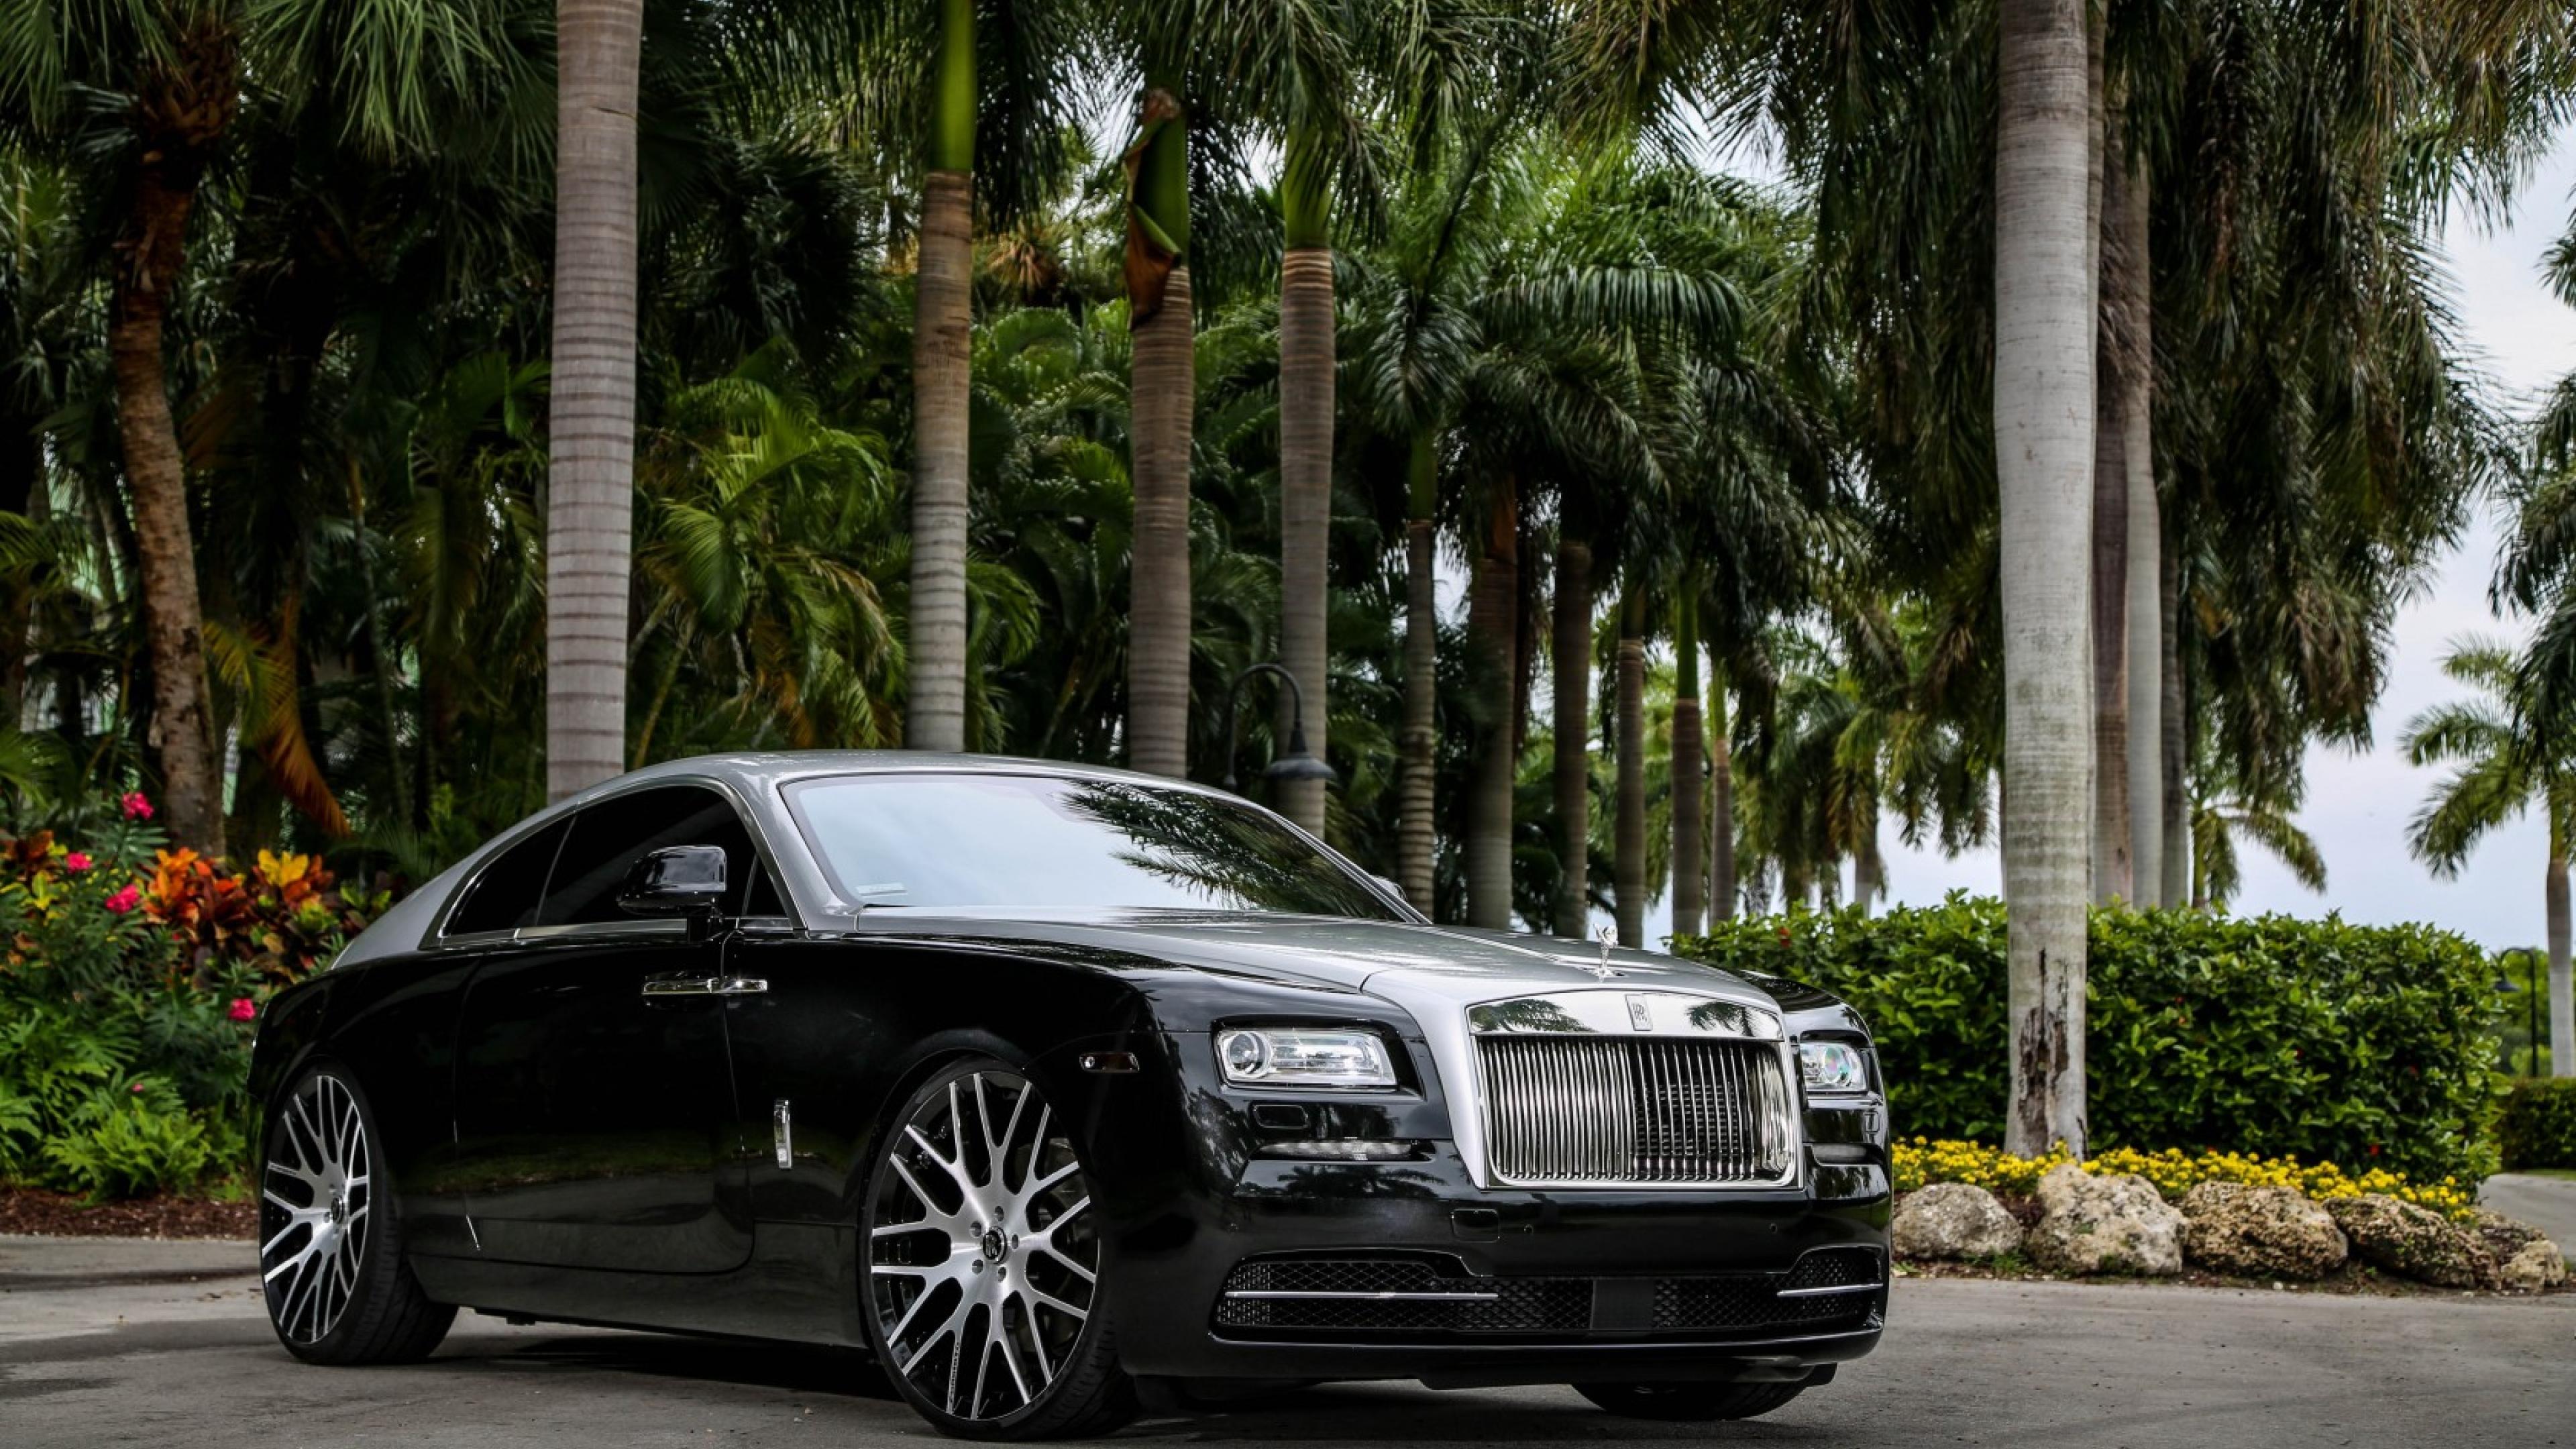 3840x2160 Rolls Royce Wraith Black 4k Wallpaper Hd Cars